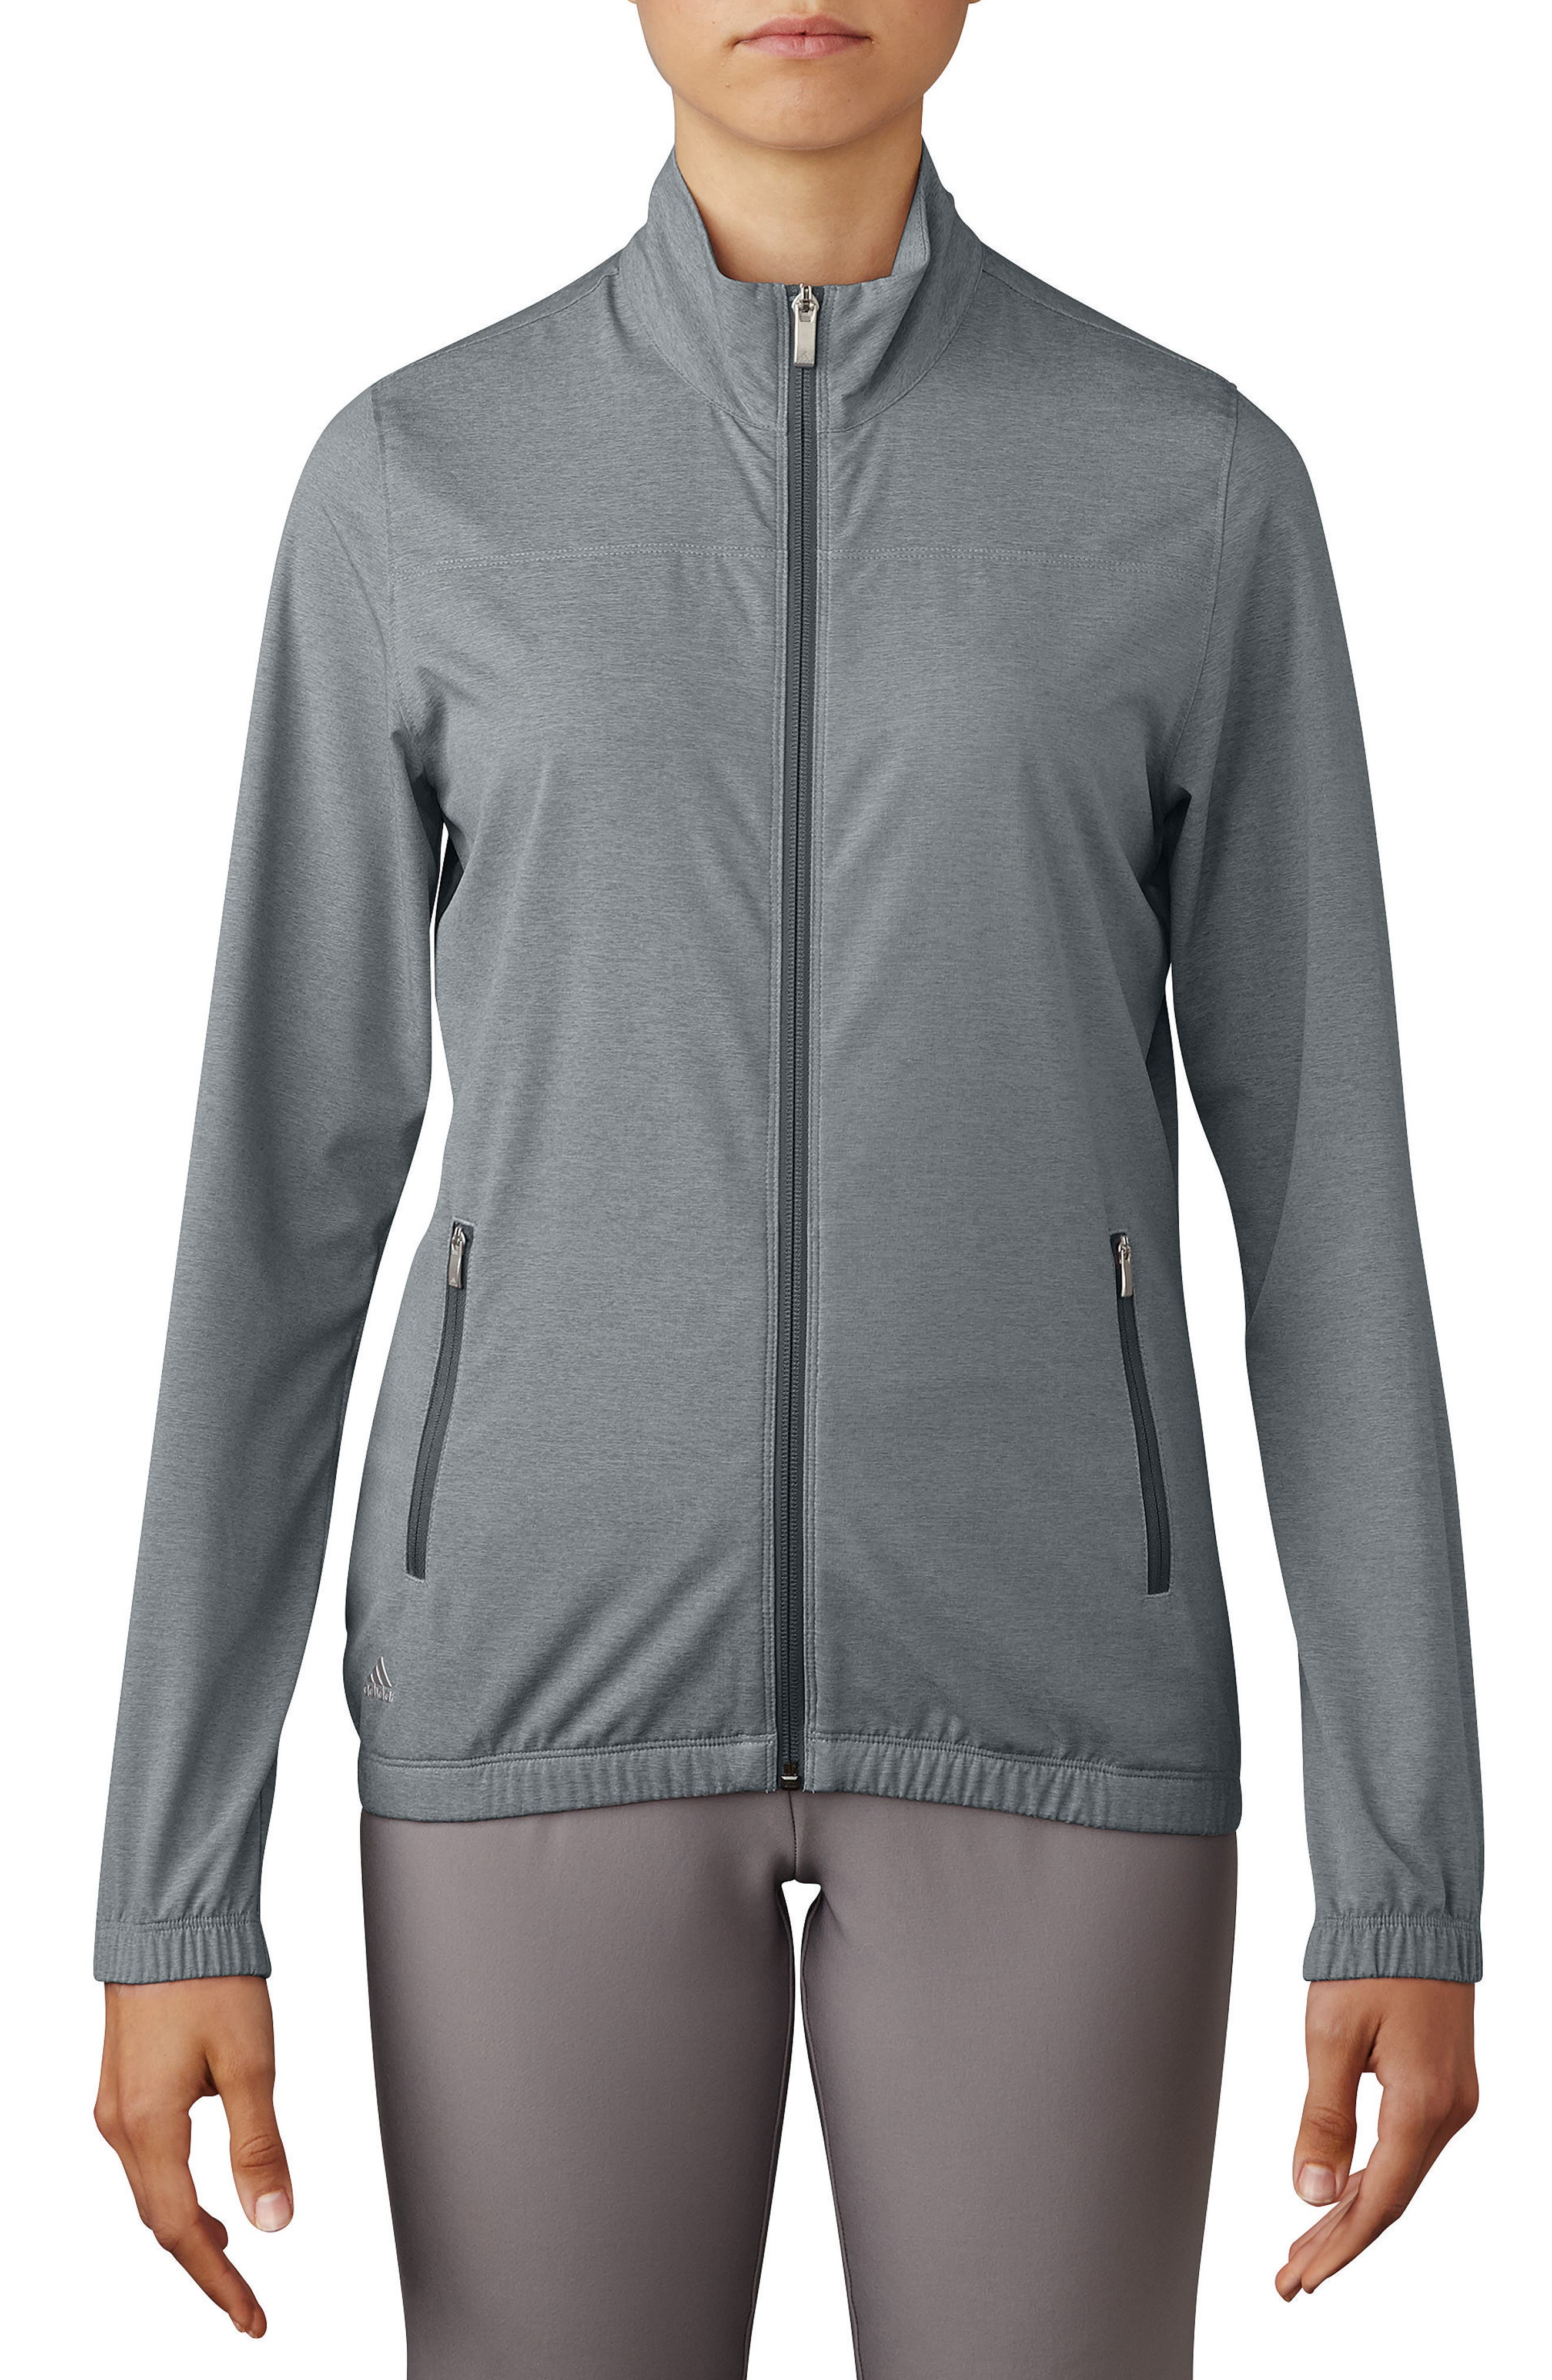 Essential Golf Wind Jacket,                         Main,                         color, 036